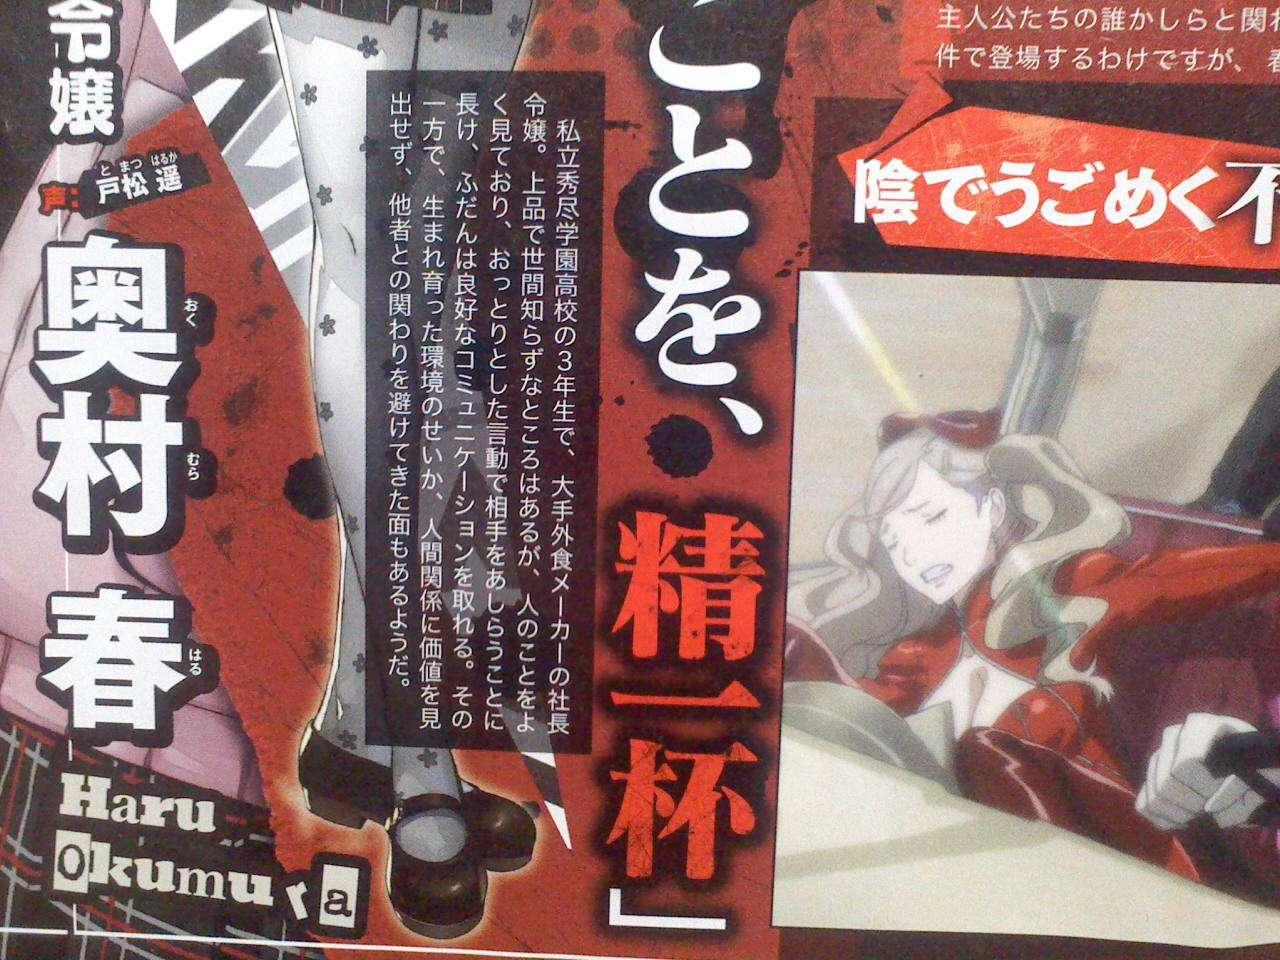 Persona-5-Famitsu-Scan-8.jpg